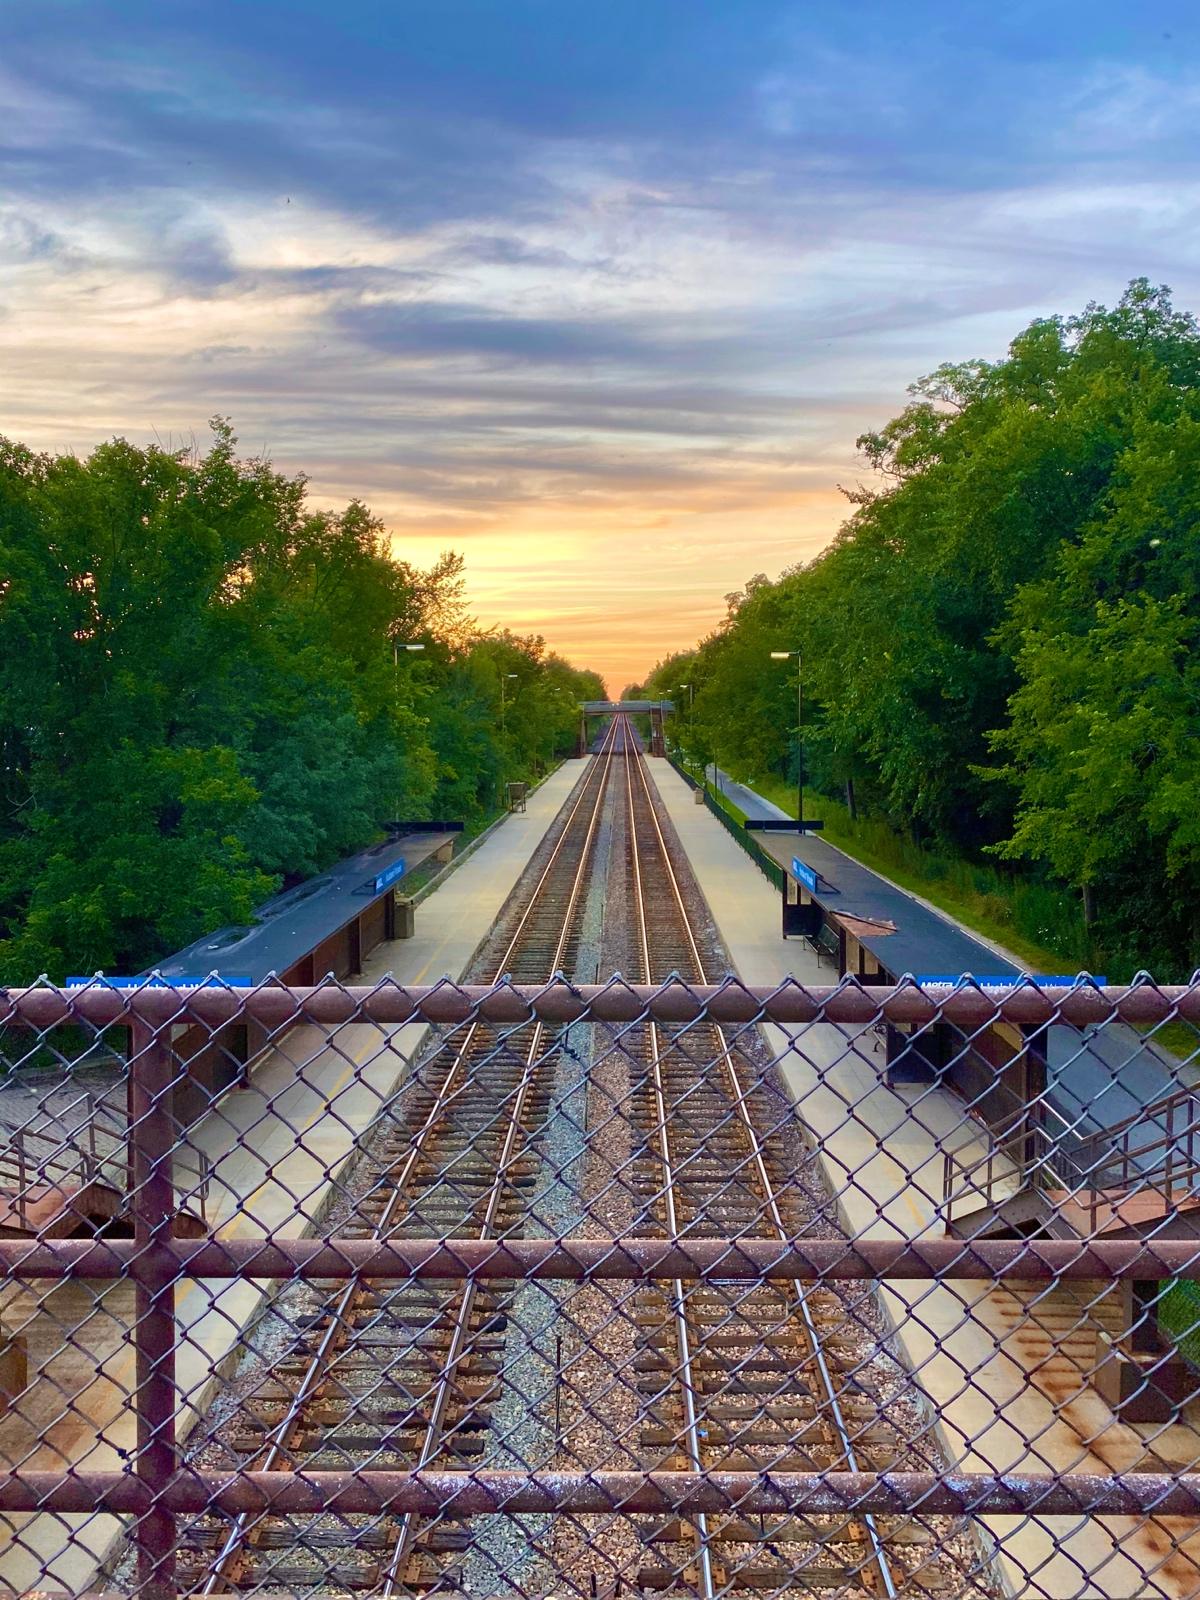 Rails and Railings…The Beautiful Journey Awaits